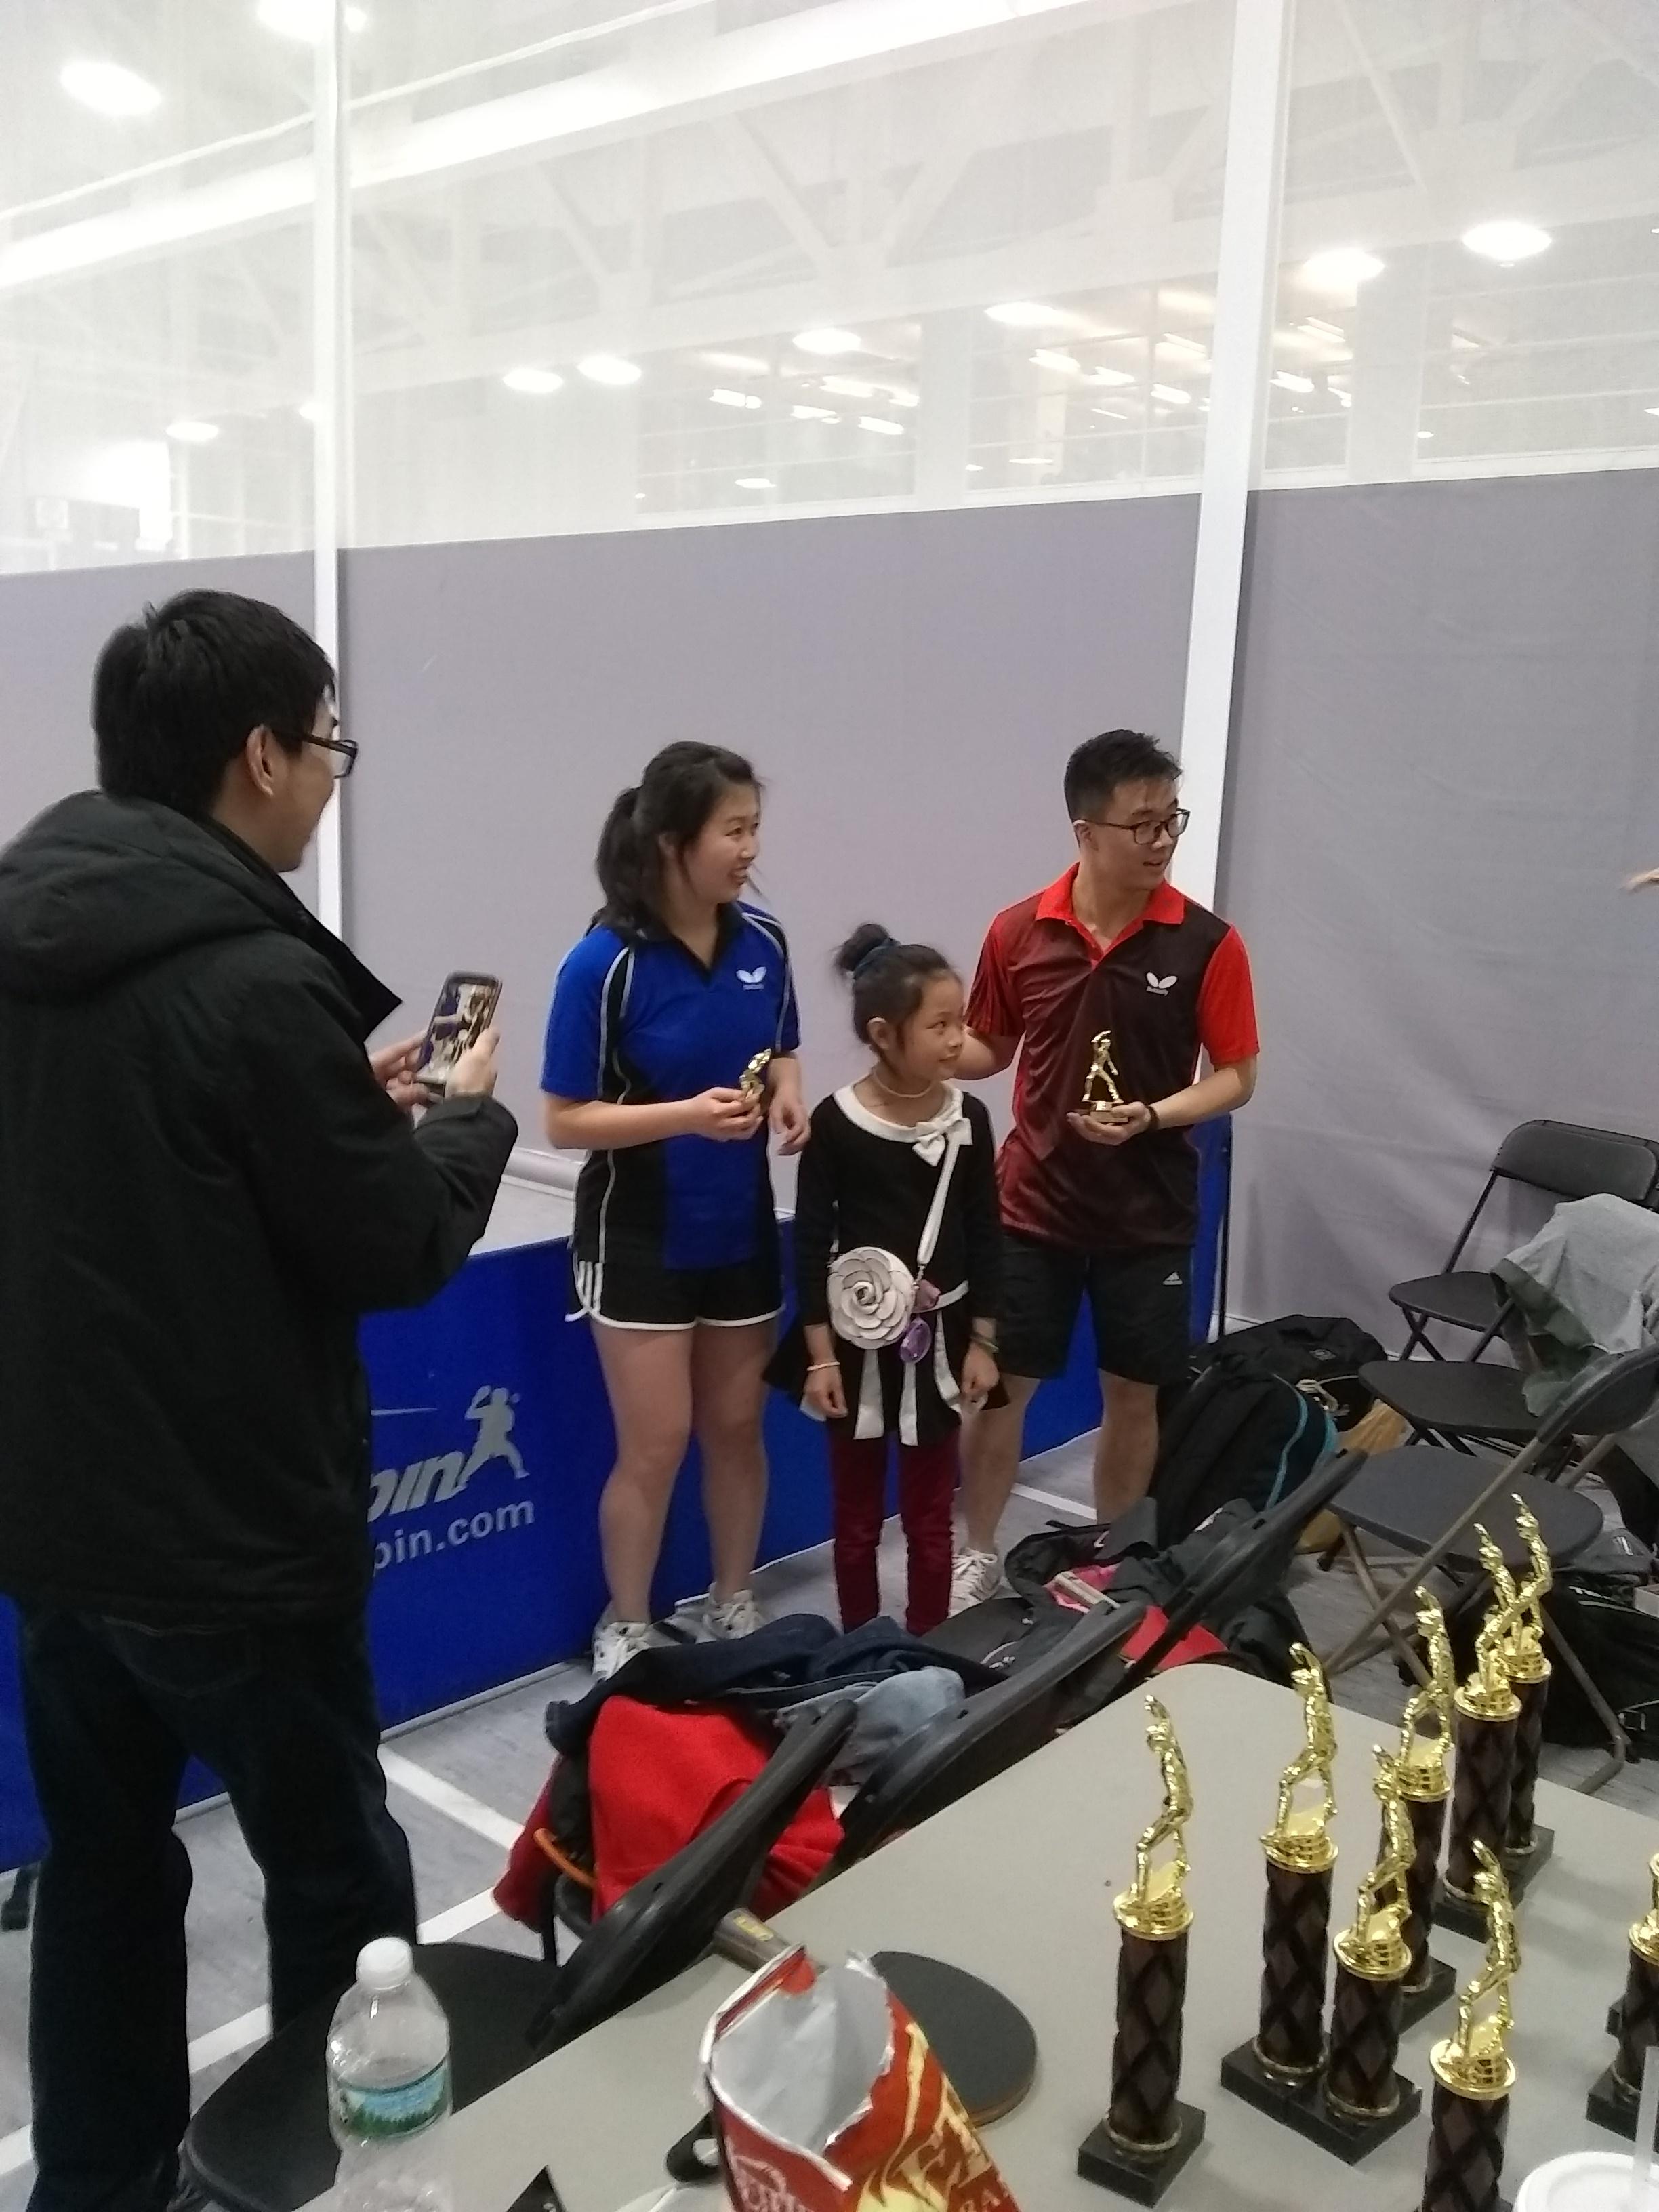 U3000 Doubles Champions